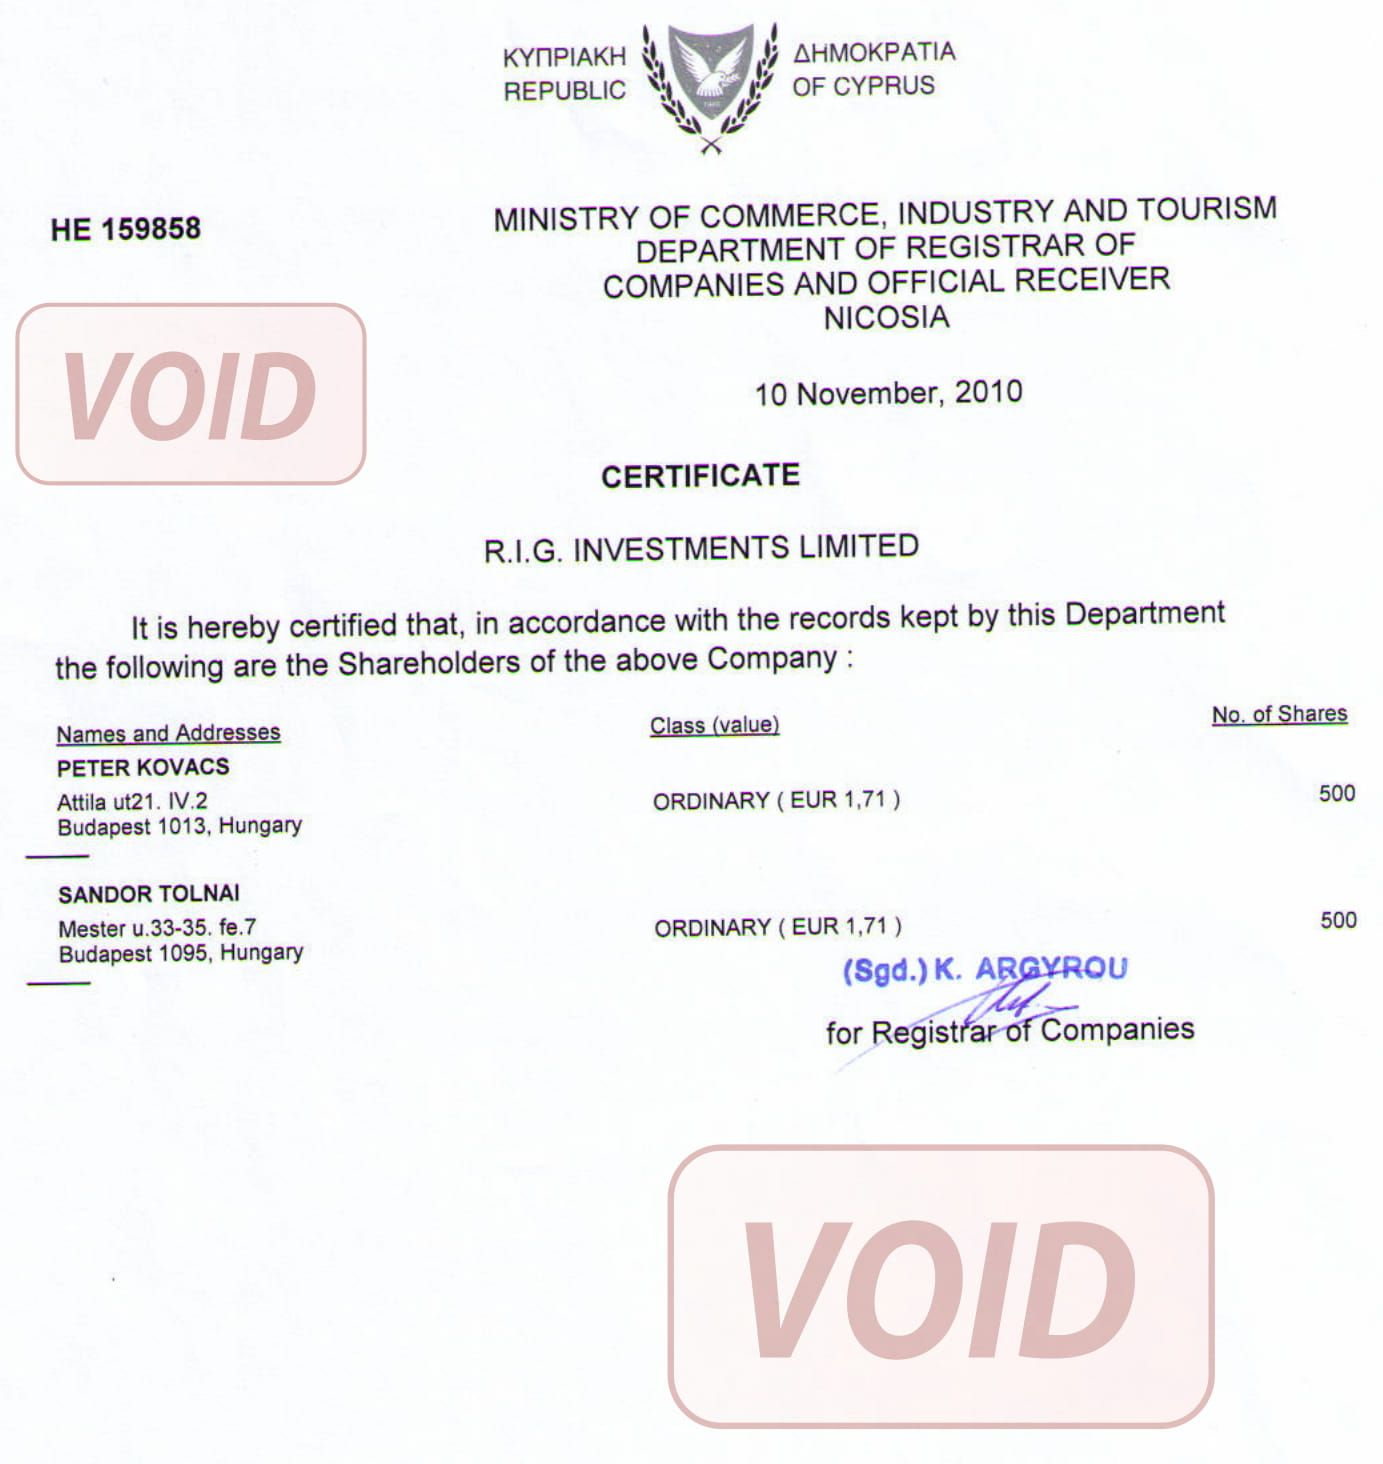 образец сертификата акционеров Certificate of shareholders Кипр